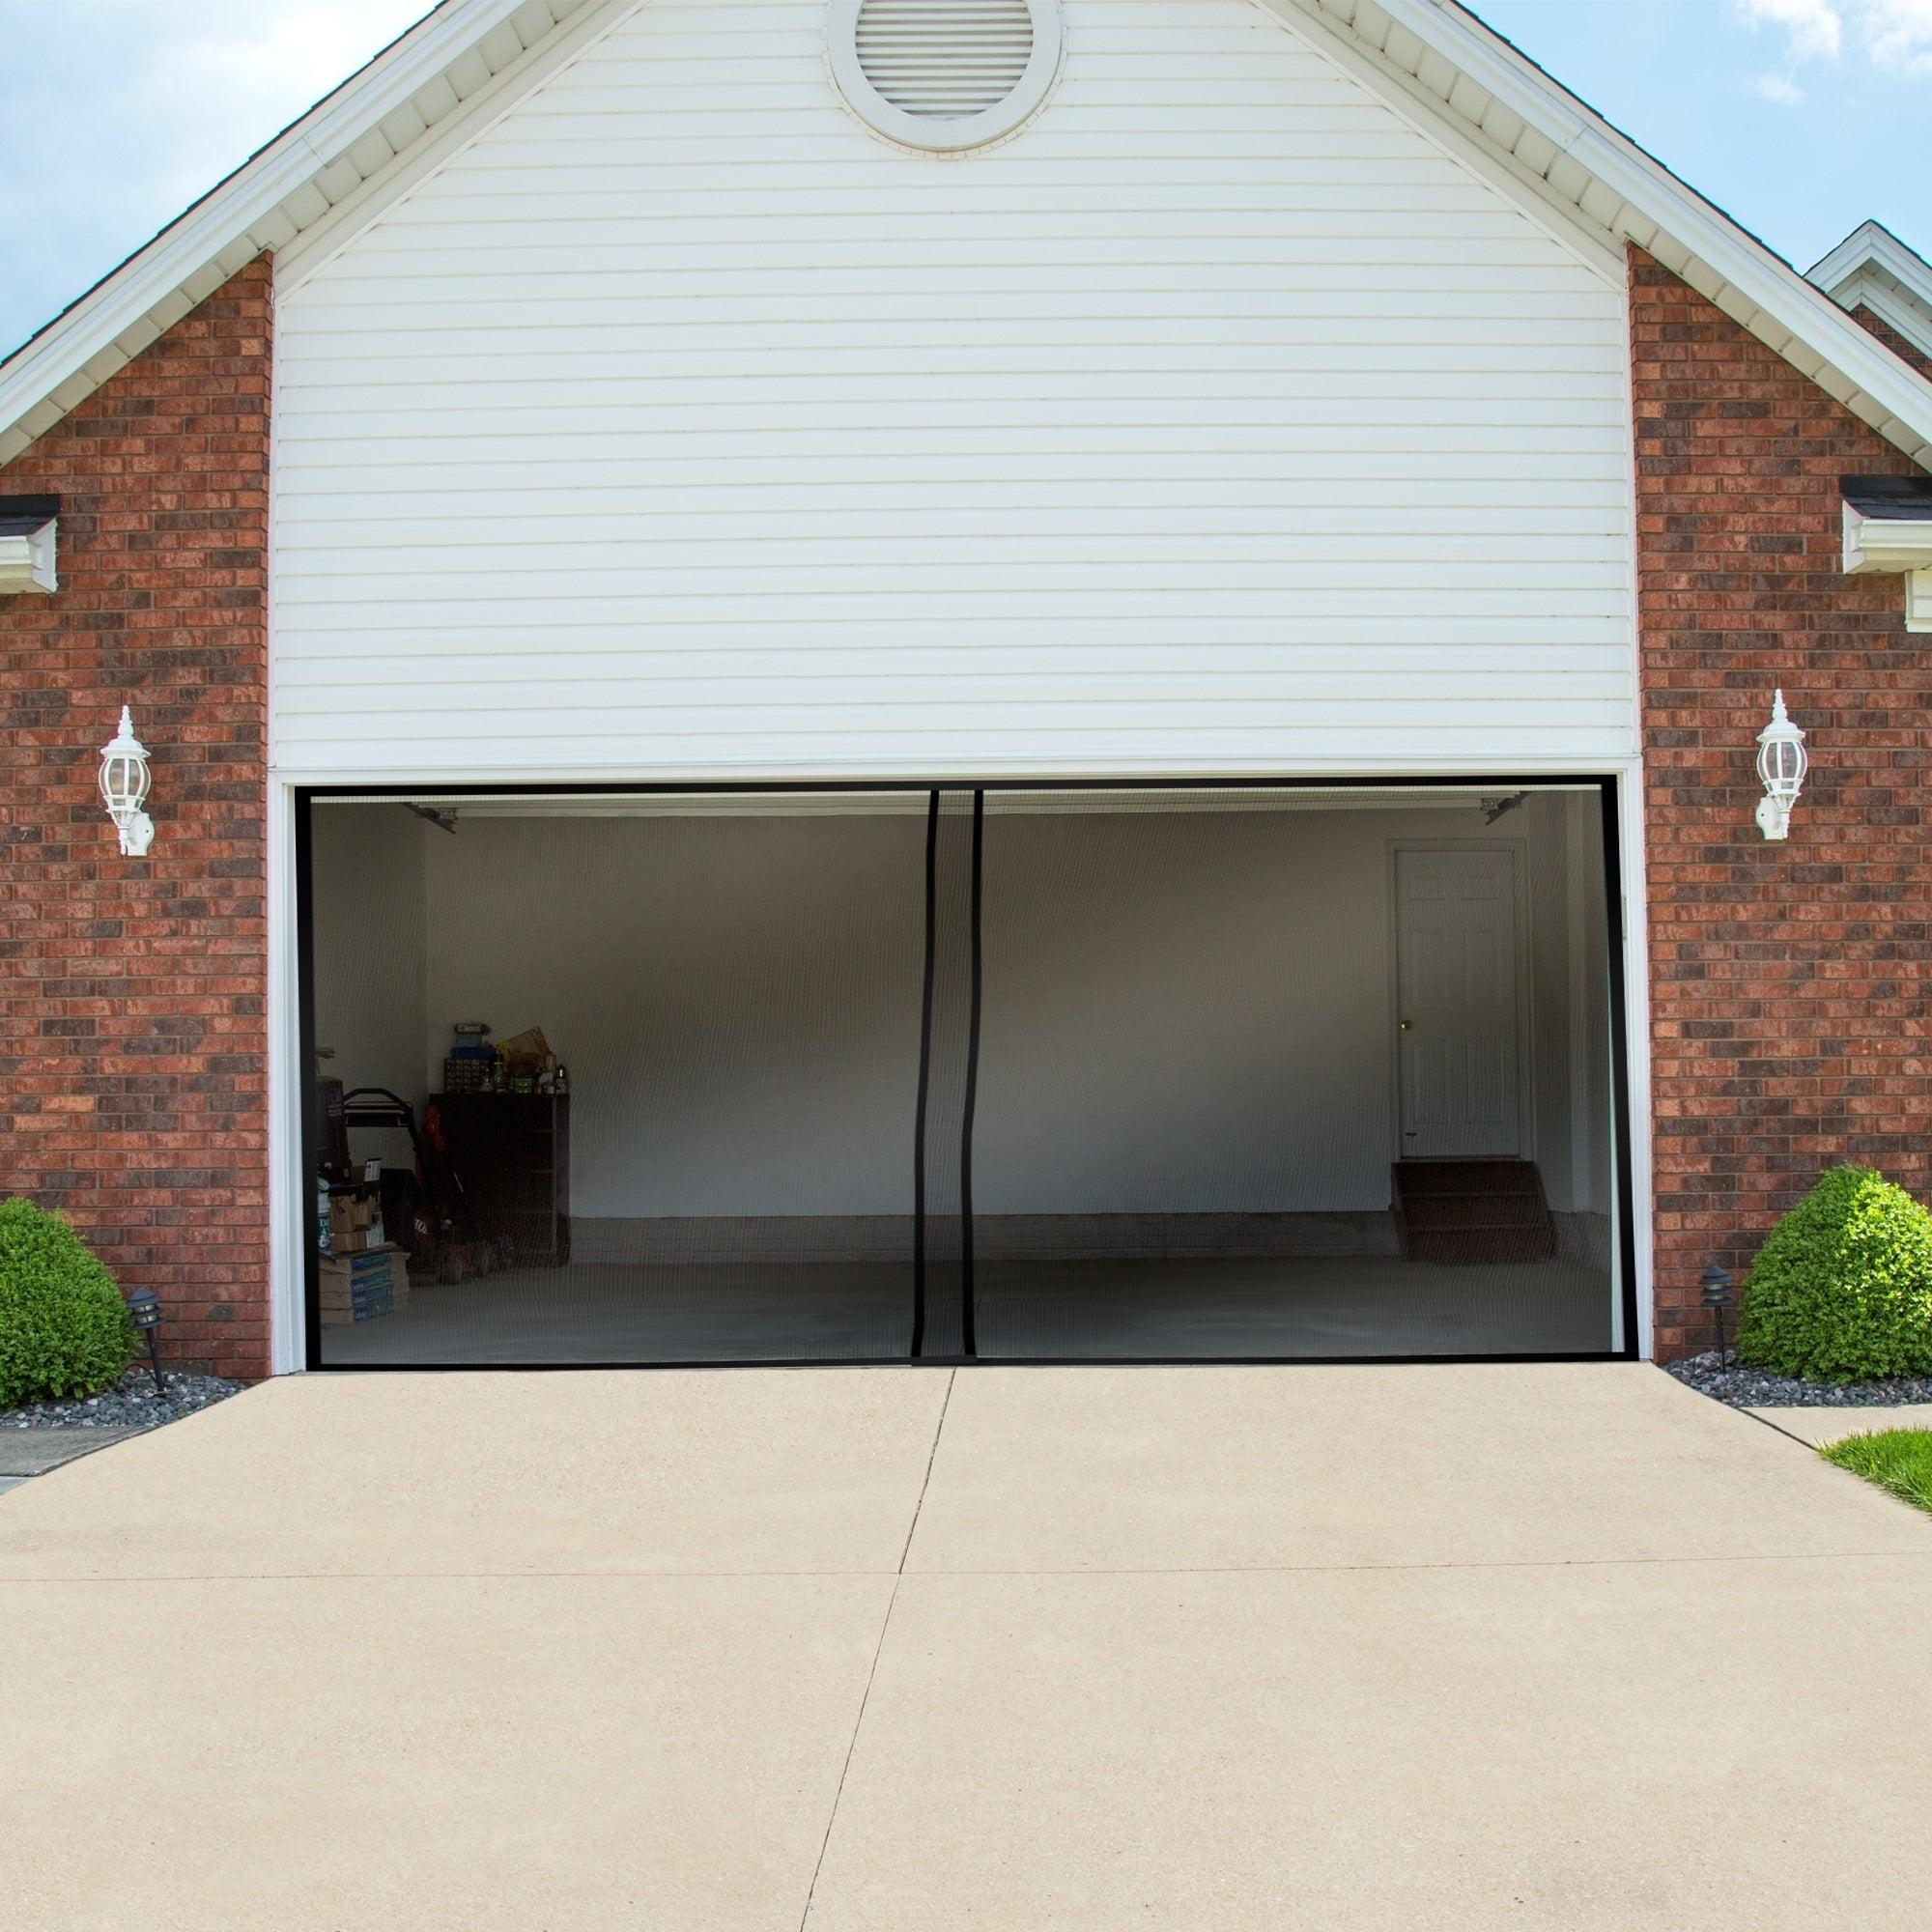 Pure Garden Two Car Garage Door Screen Curtain Black 202 X 90 Inches On Sale Overstock 14079259